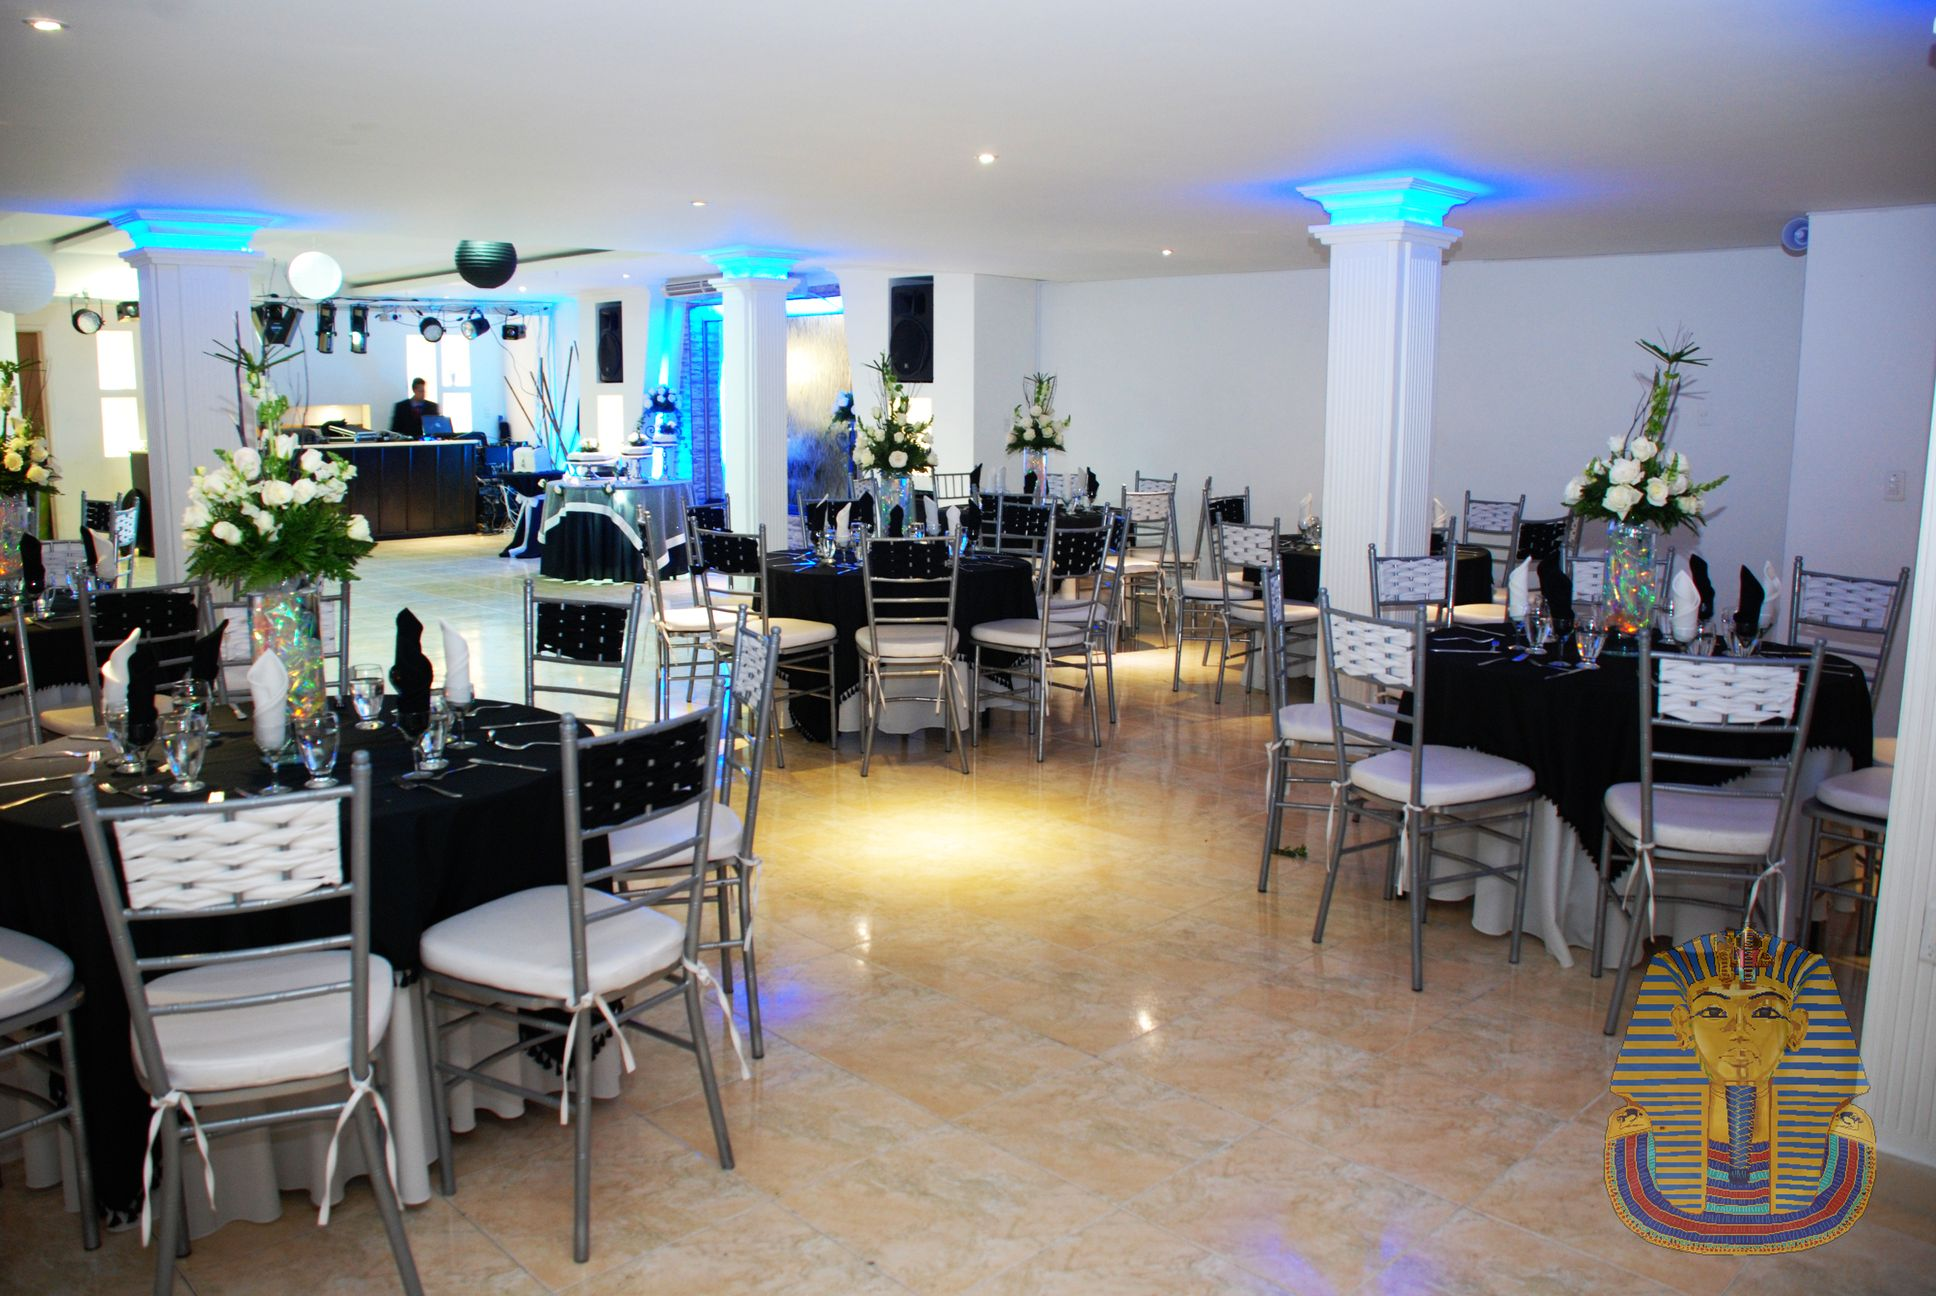 Salon de eventos bodas campestres salon de recepciones for Acropolis salon de eventos